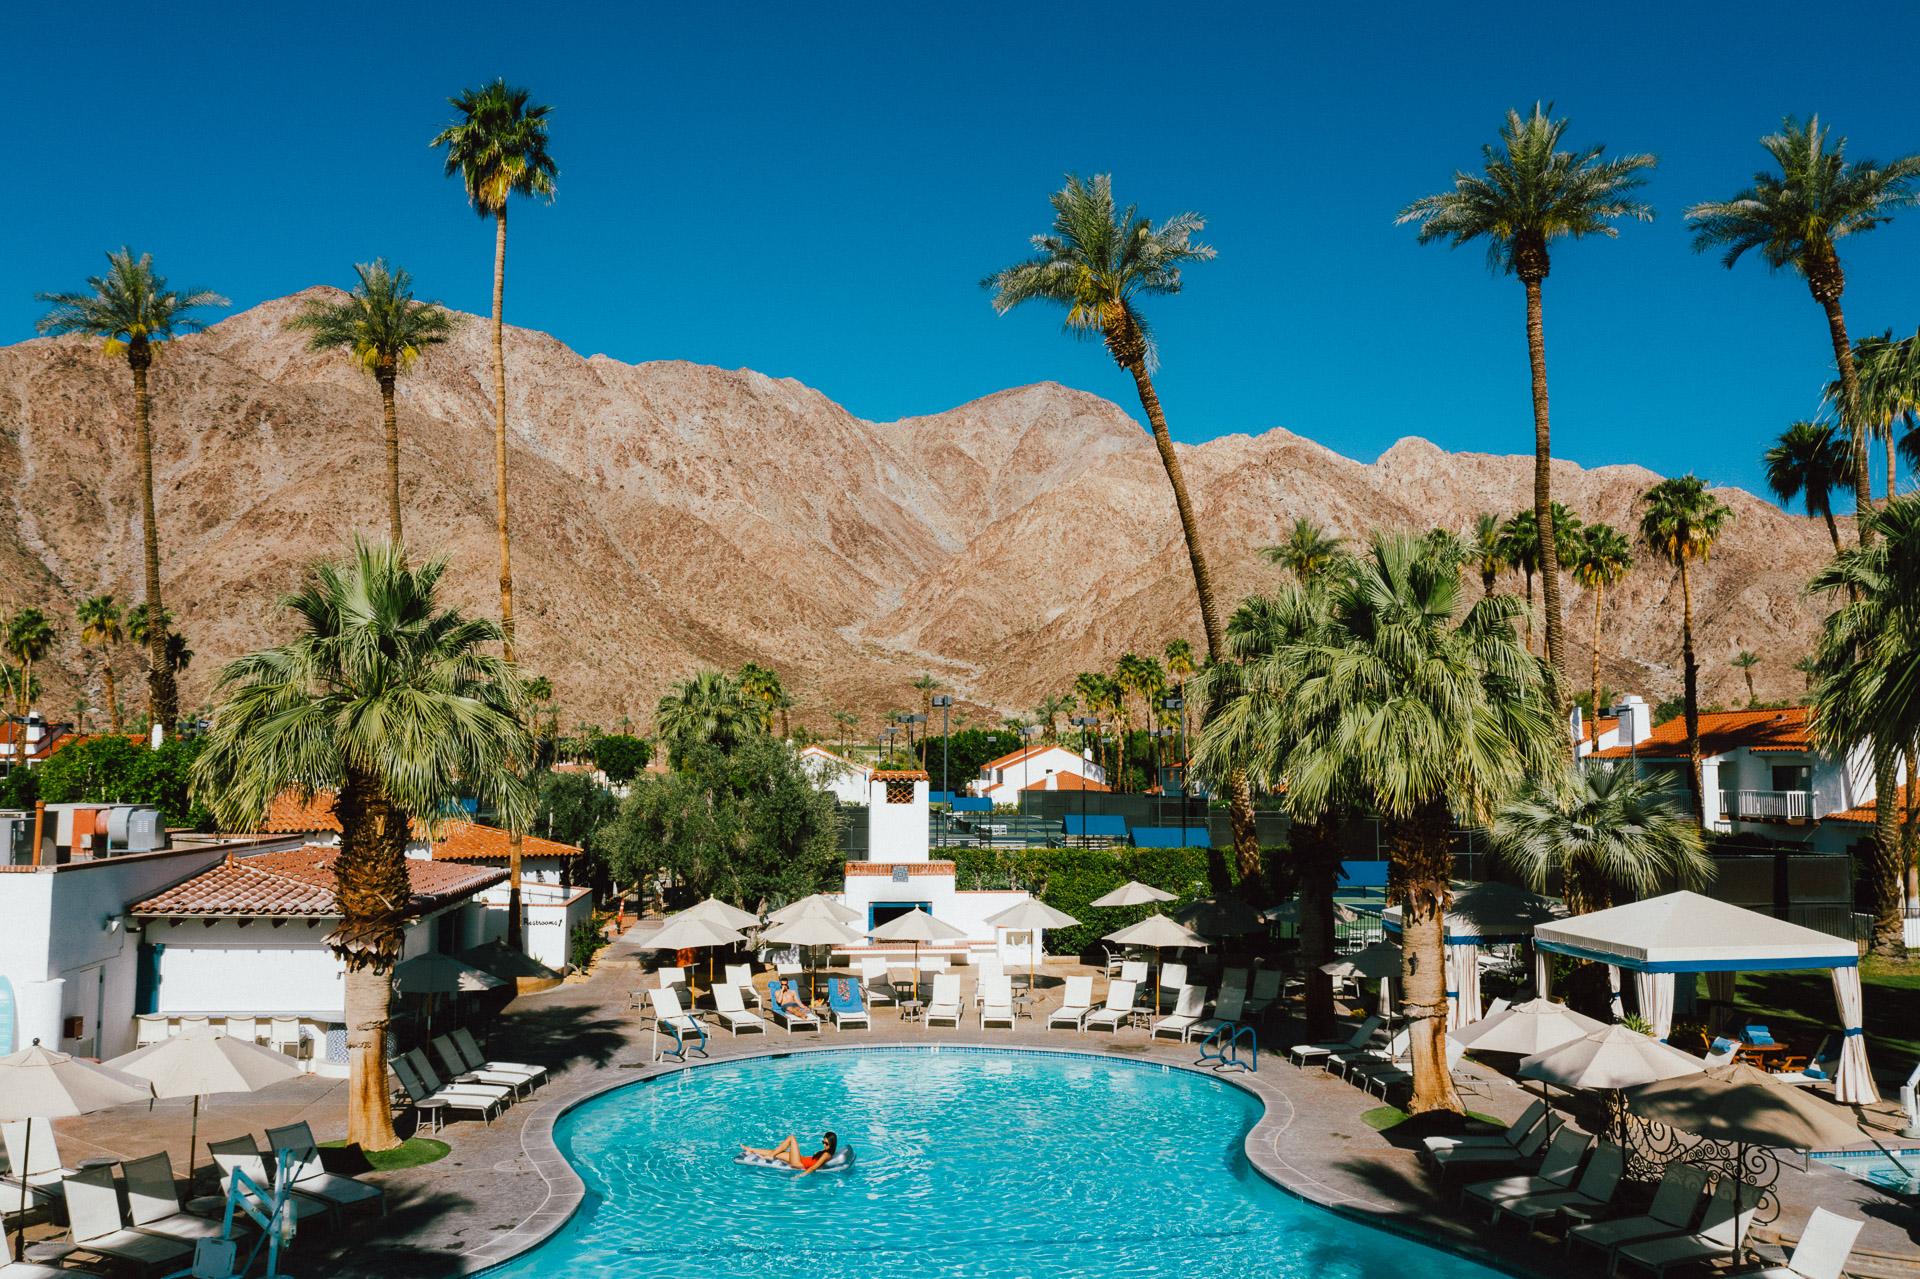 la quinta resort - palm springs, california